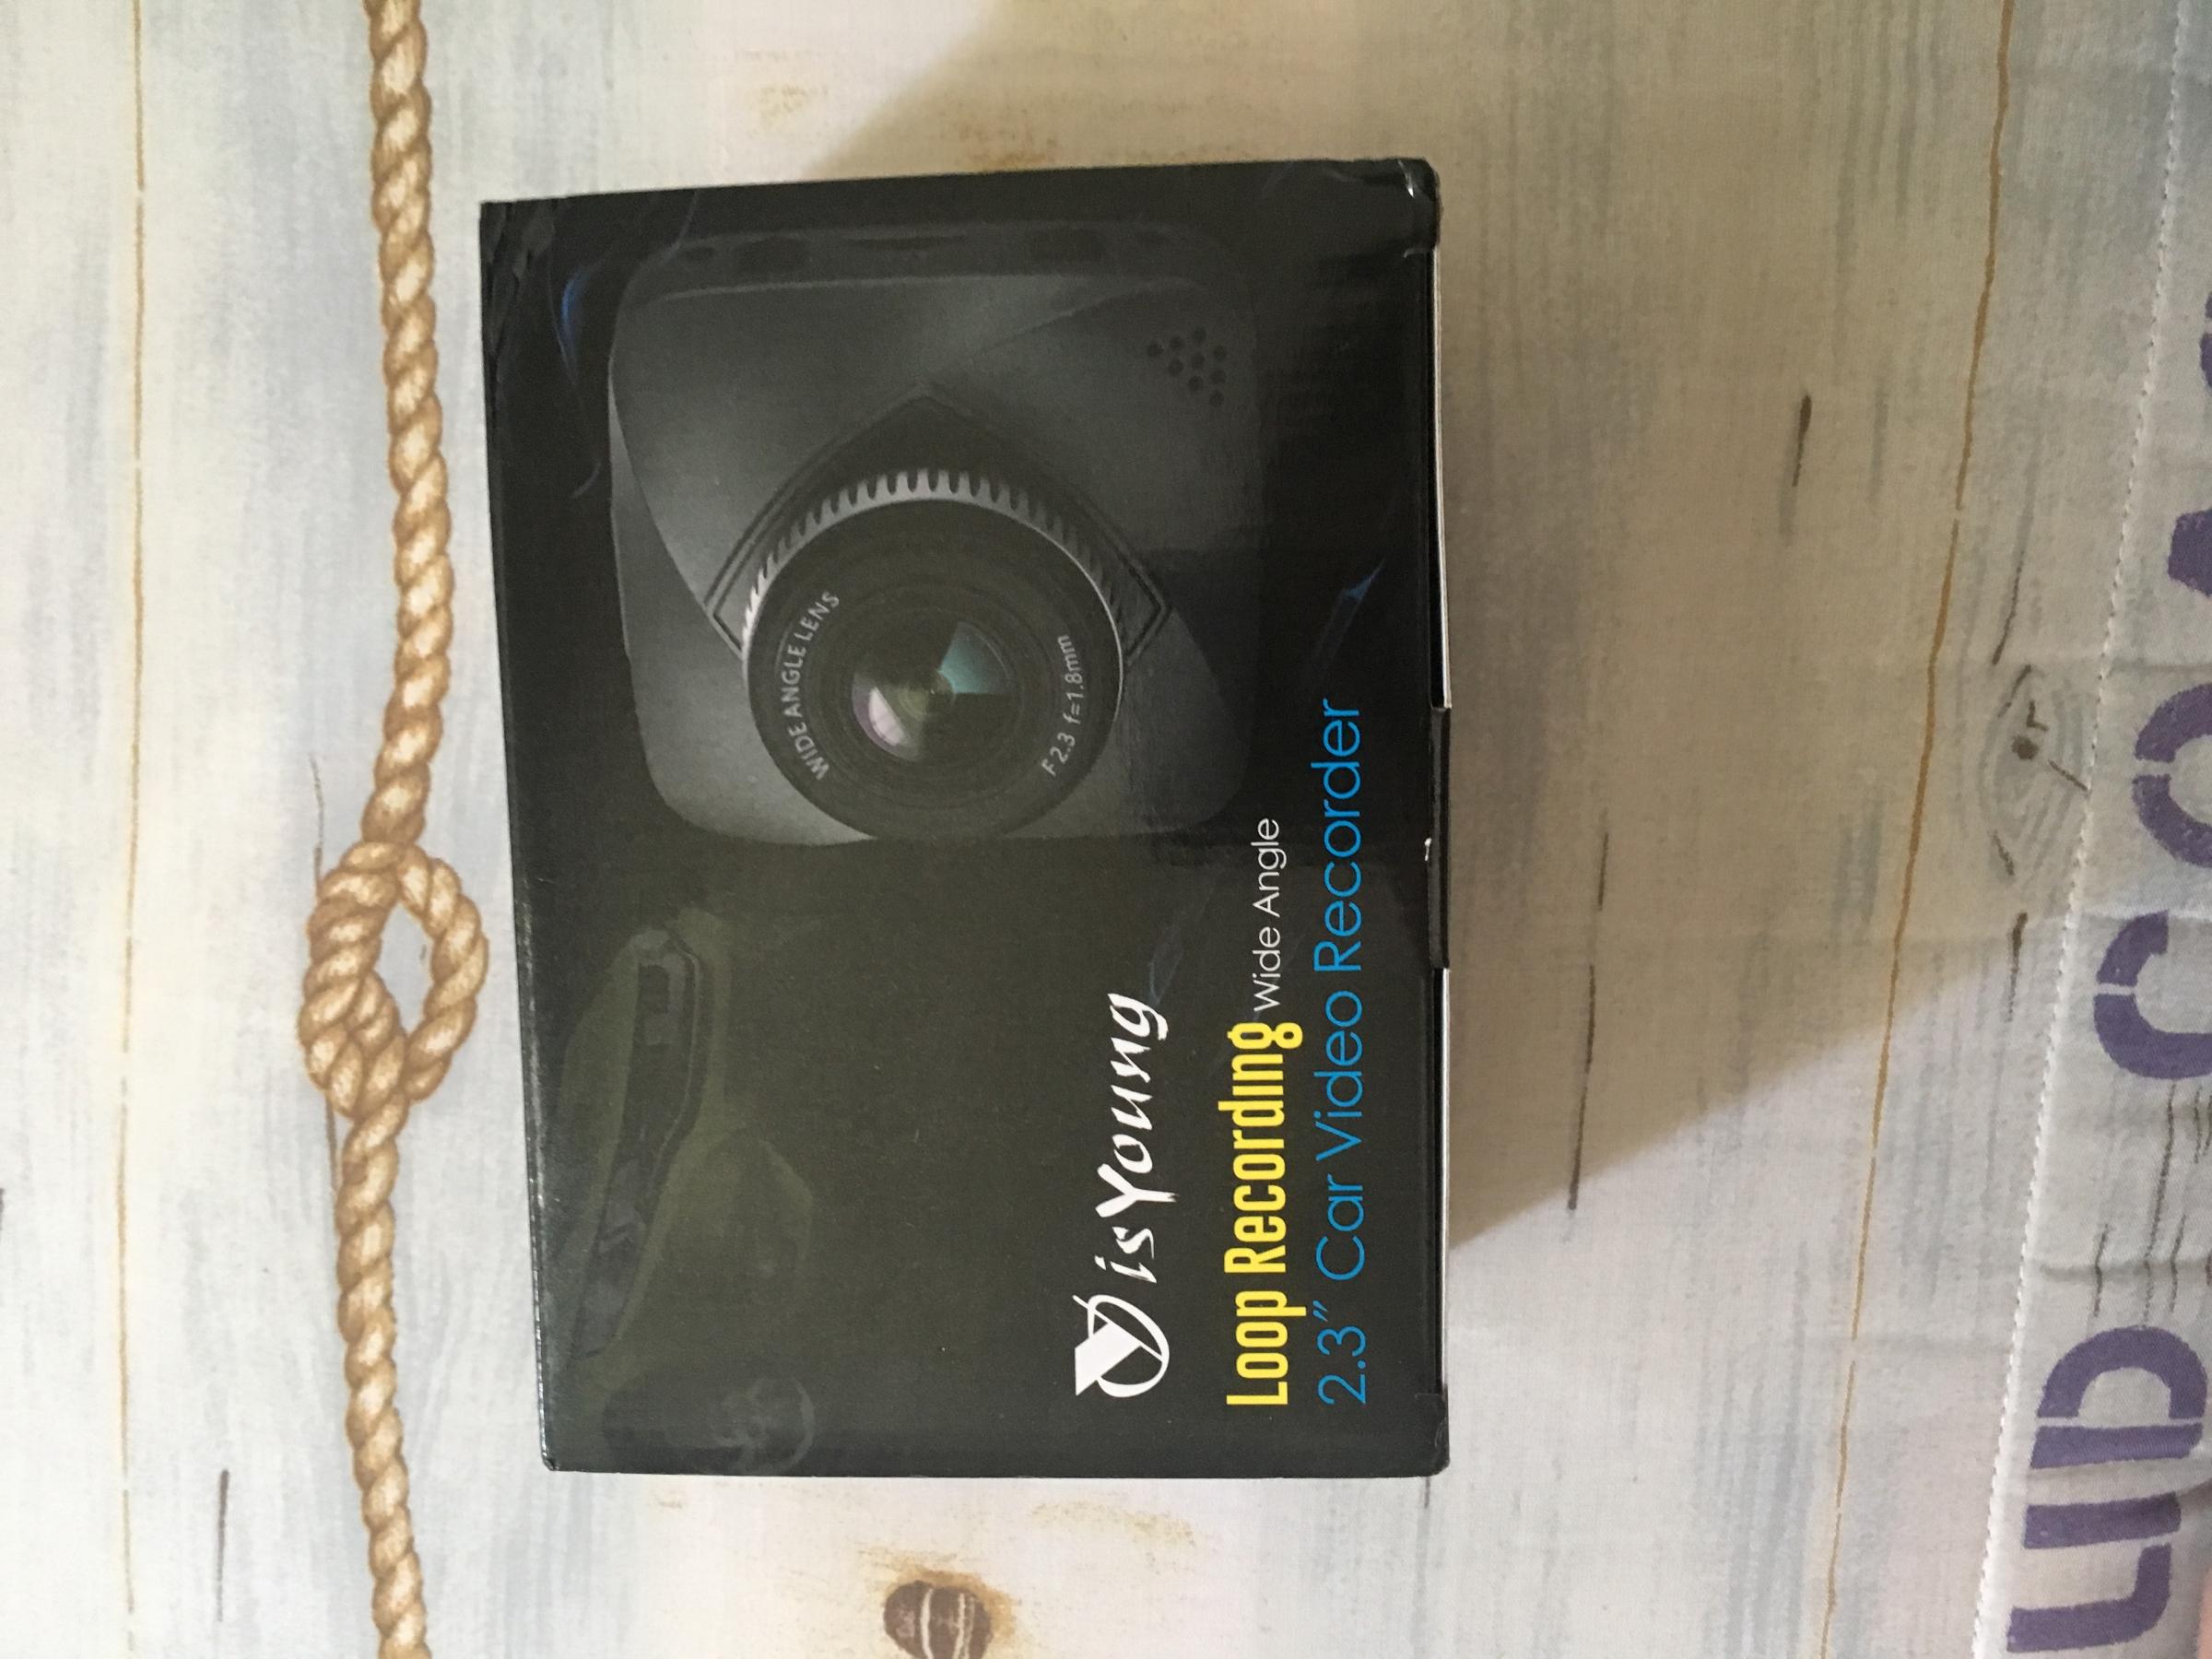 Superbe caméra